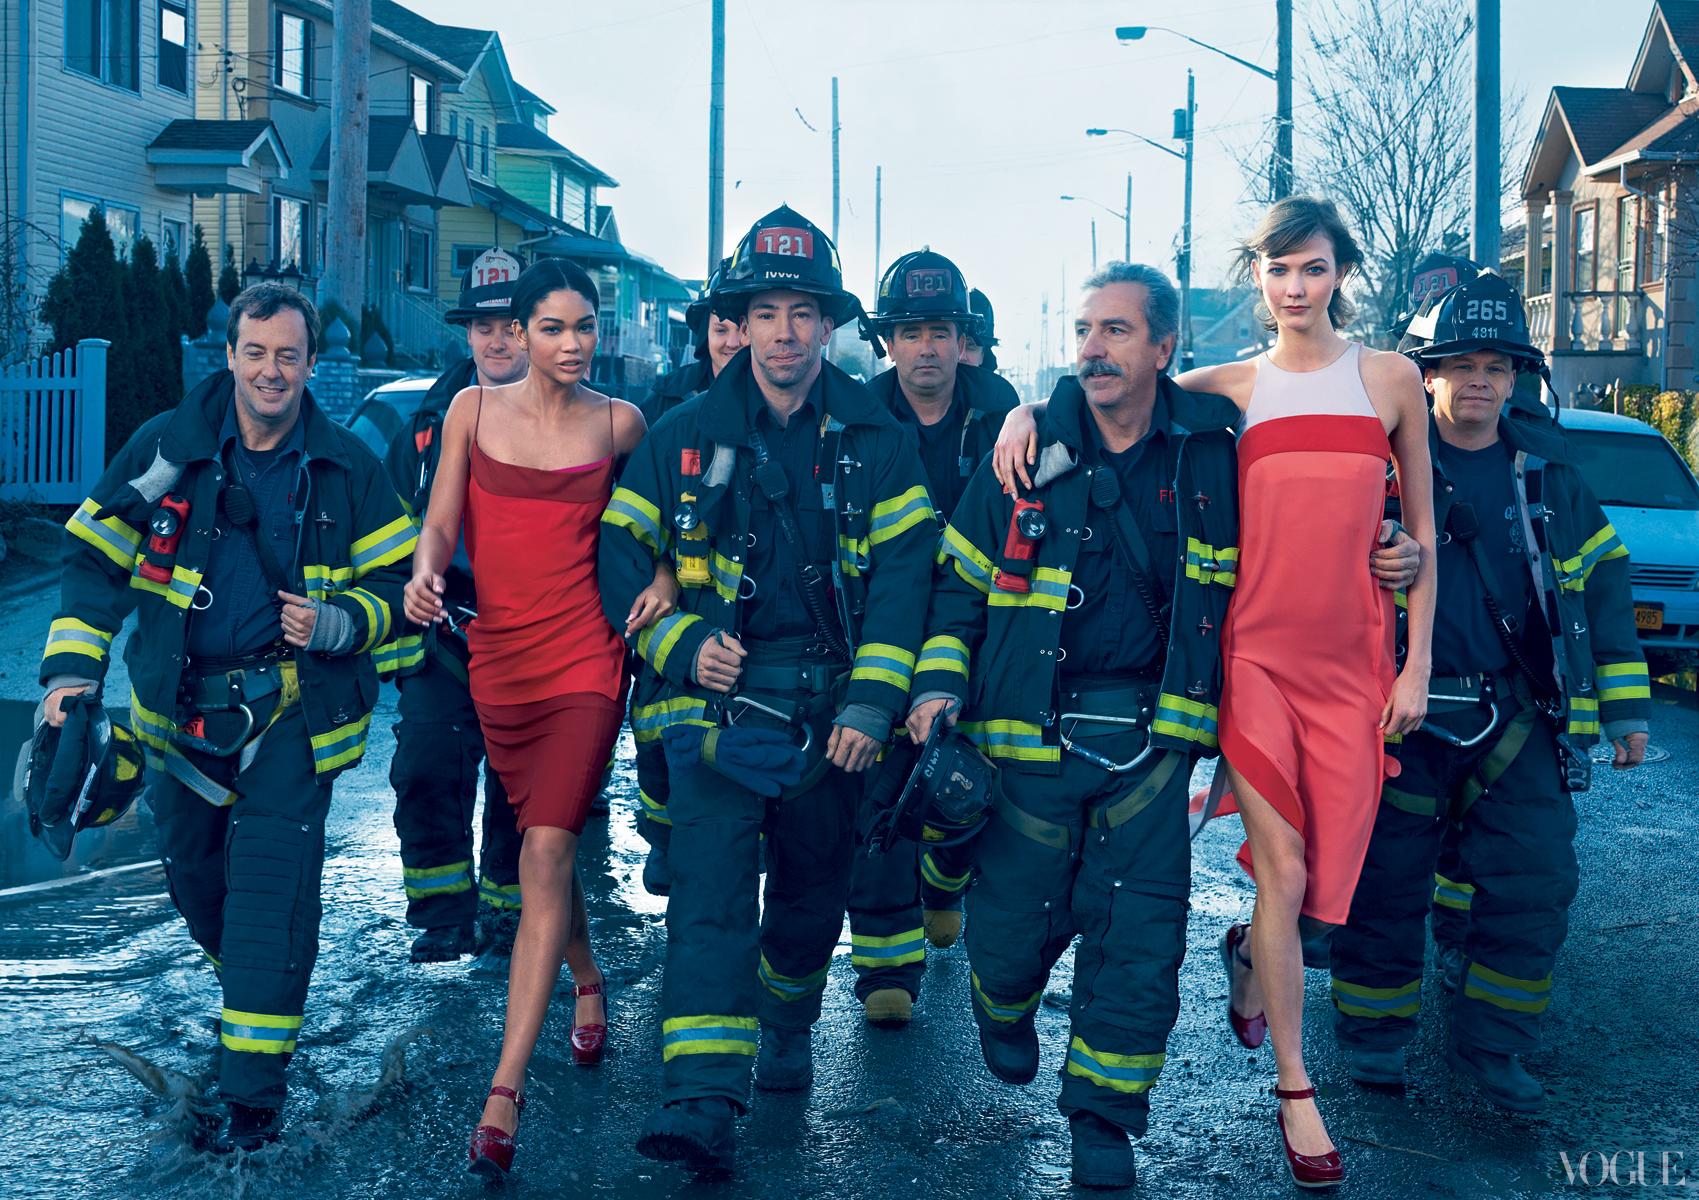 Annie Leibovitz, Hurricane Sandy photo shoot for Vogue, 2013